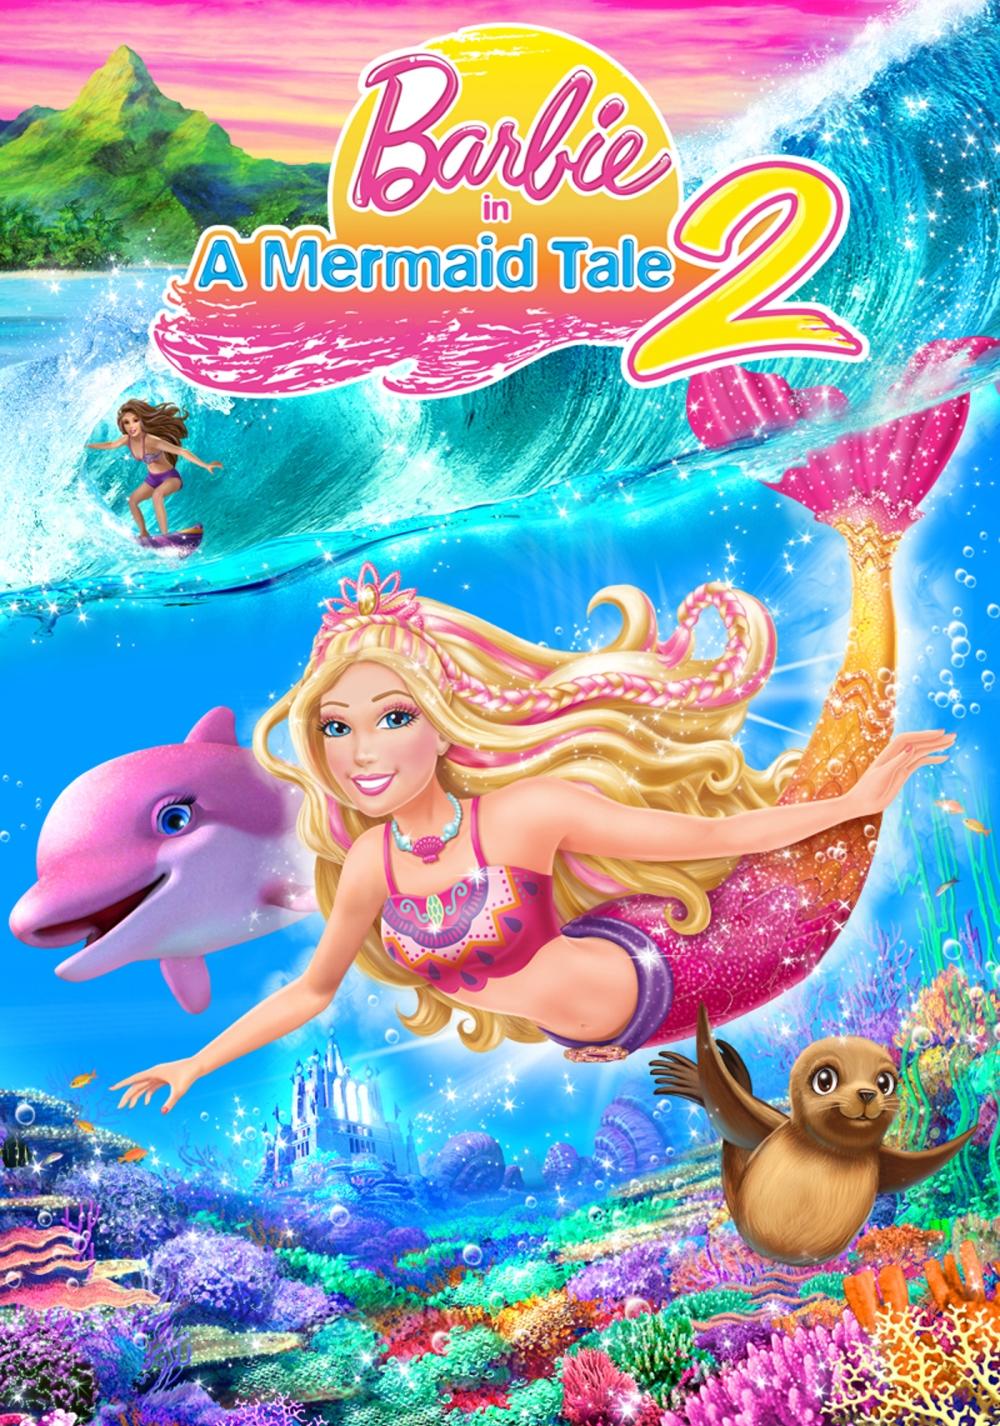 Barbie in A Mermaid Tale ‿ - YouTube